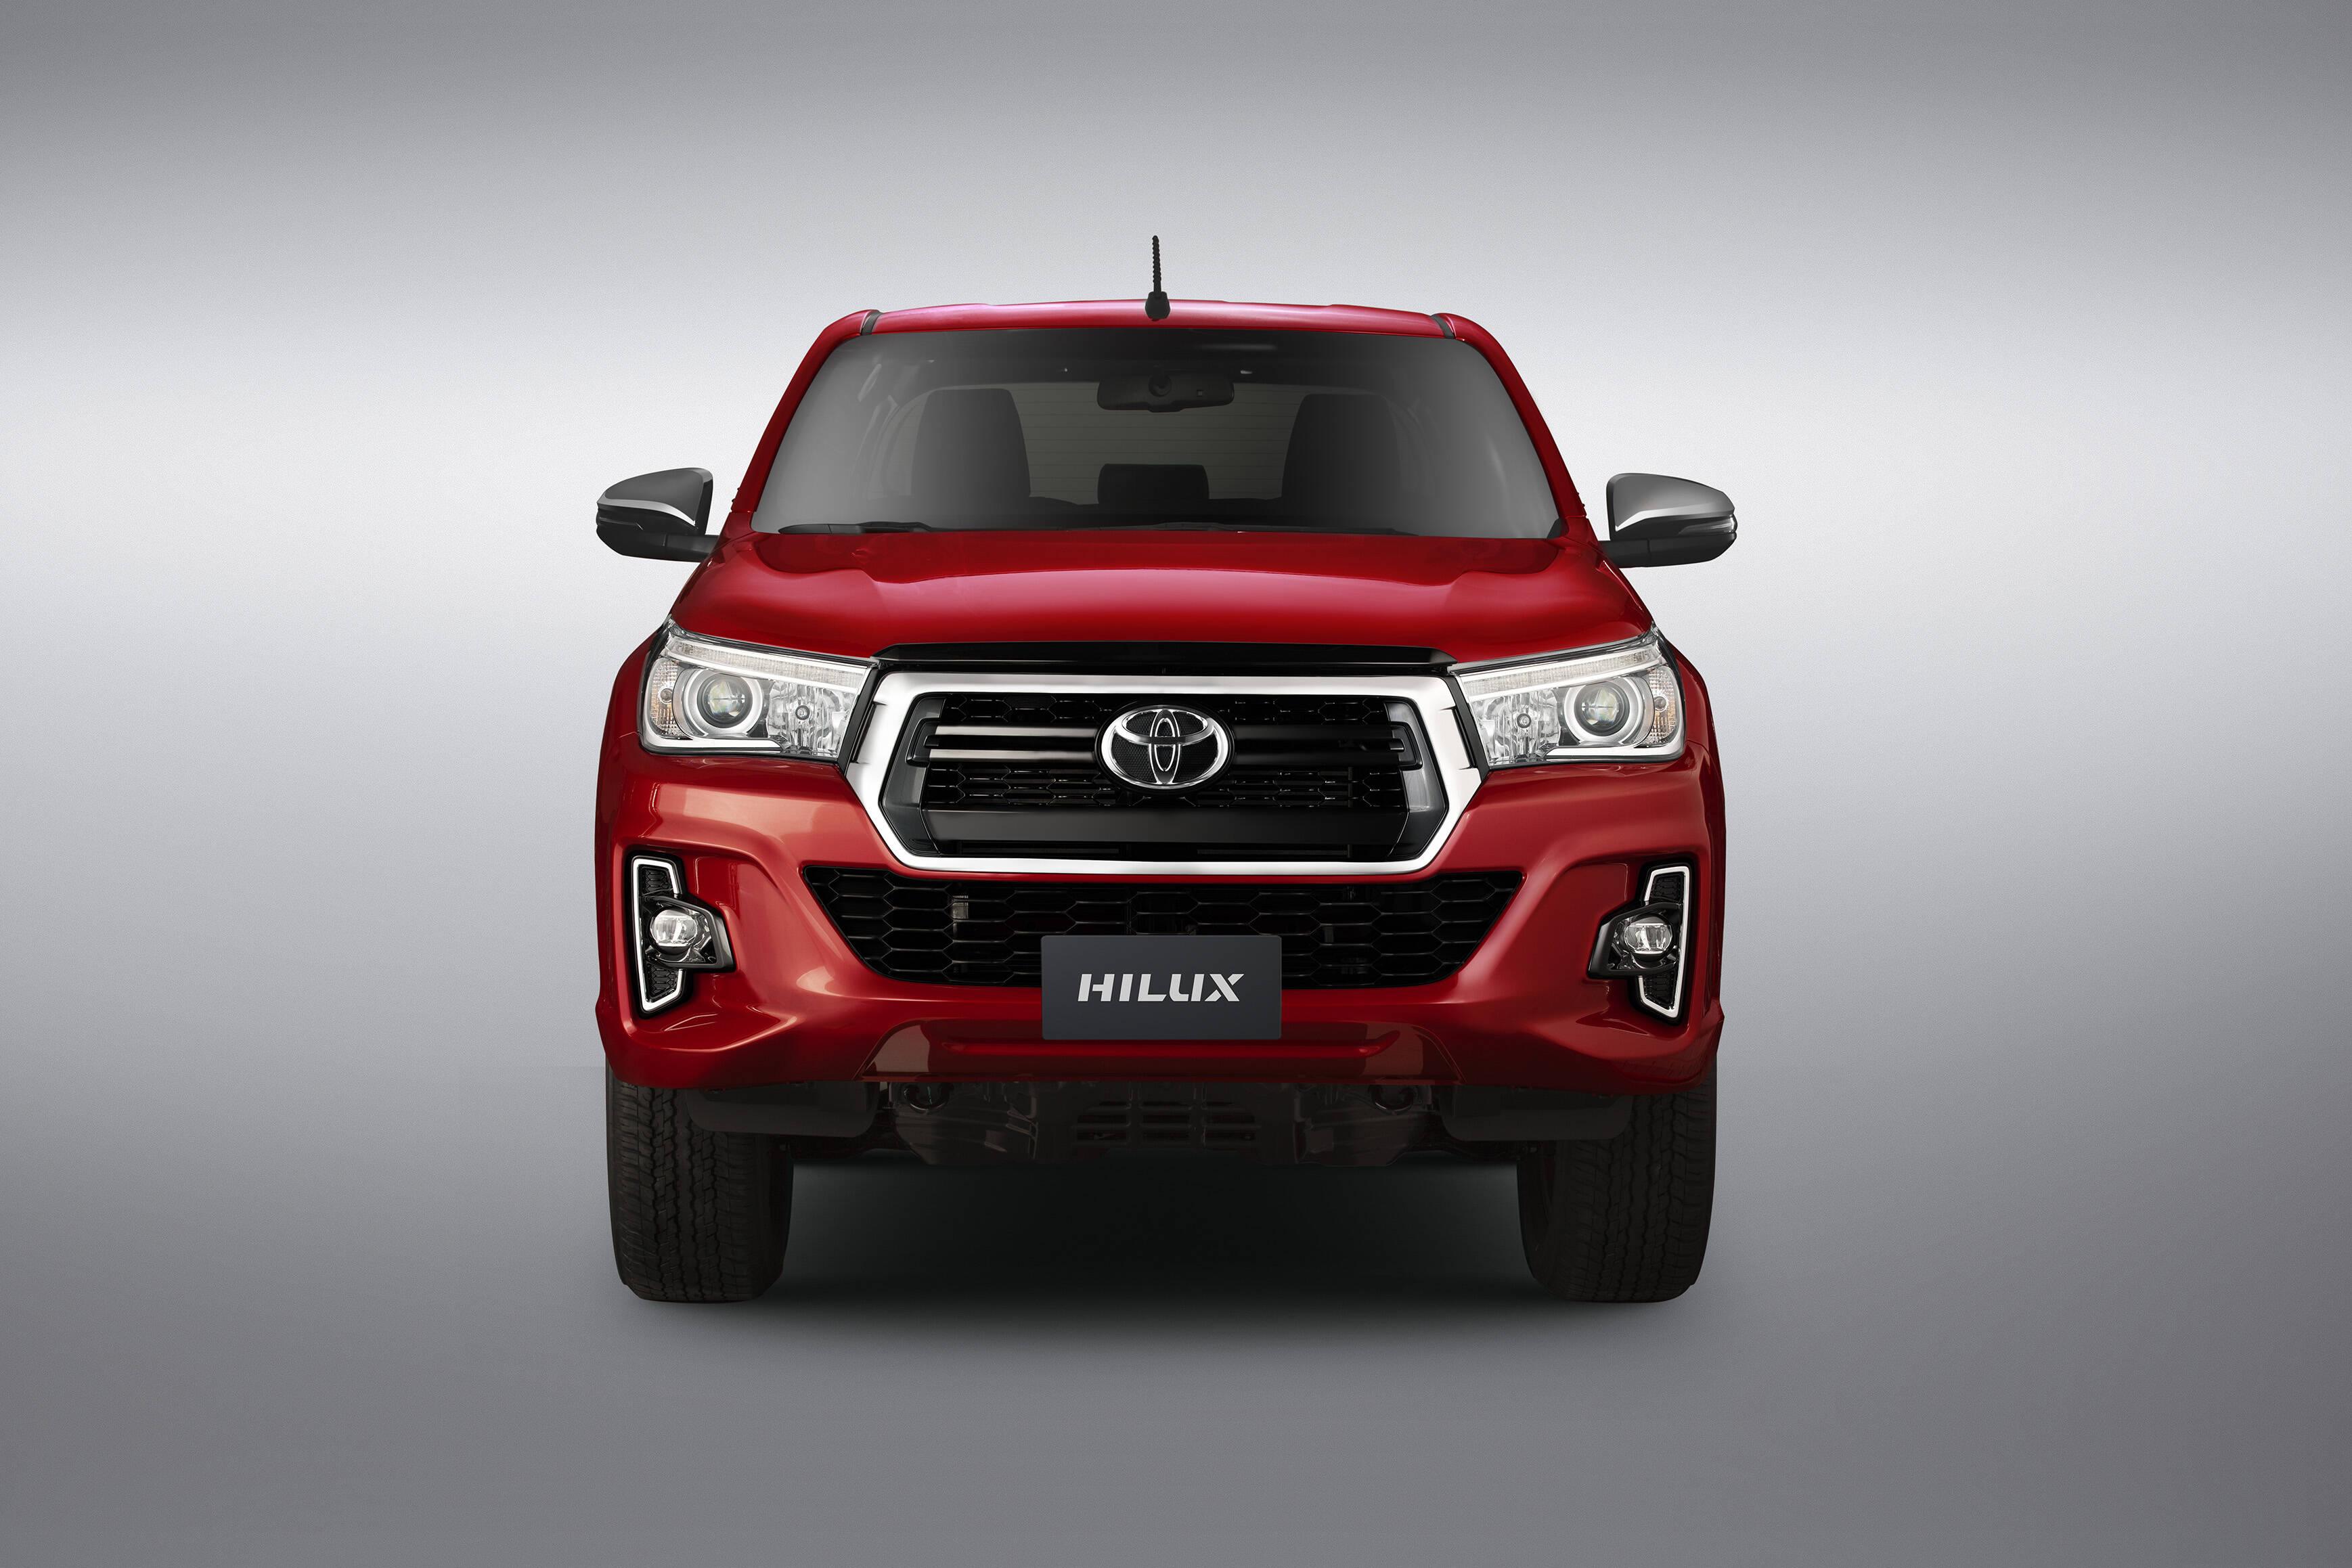 3. Toyota Hilux 2019